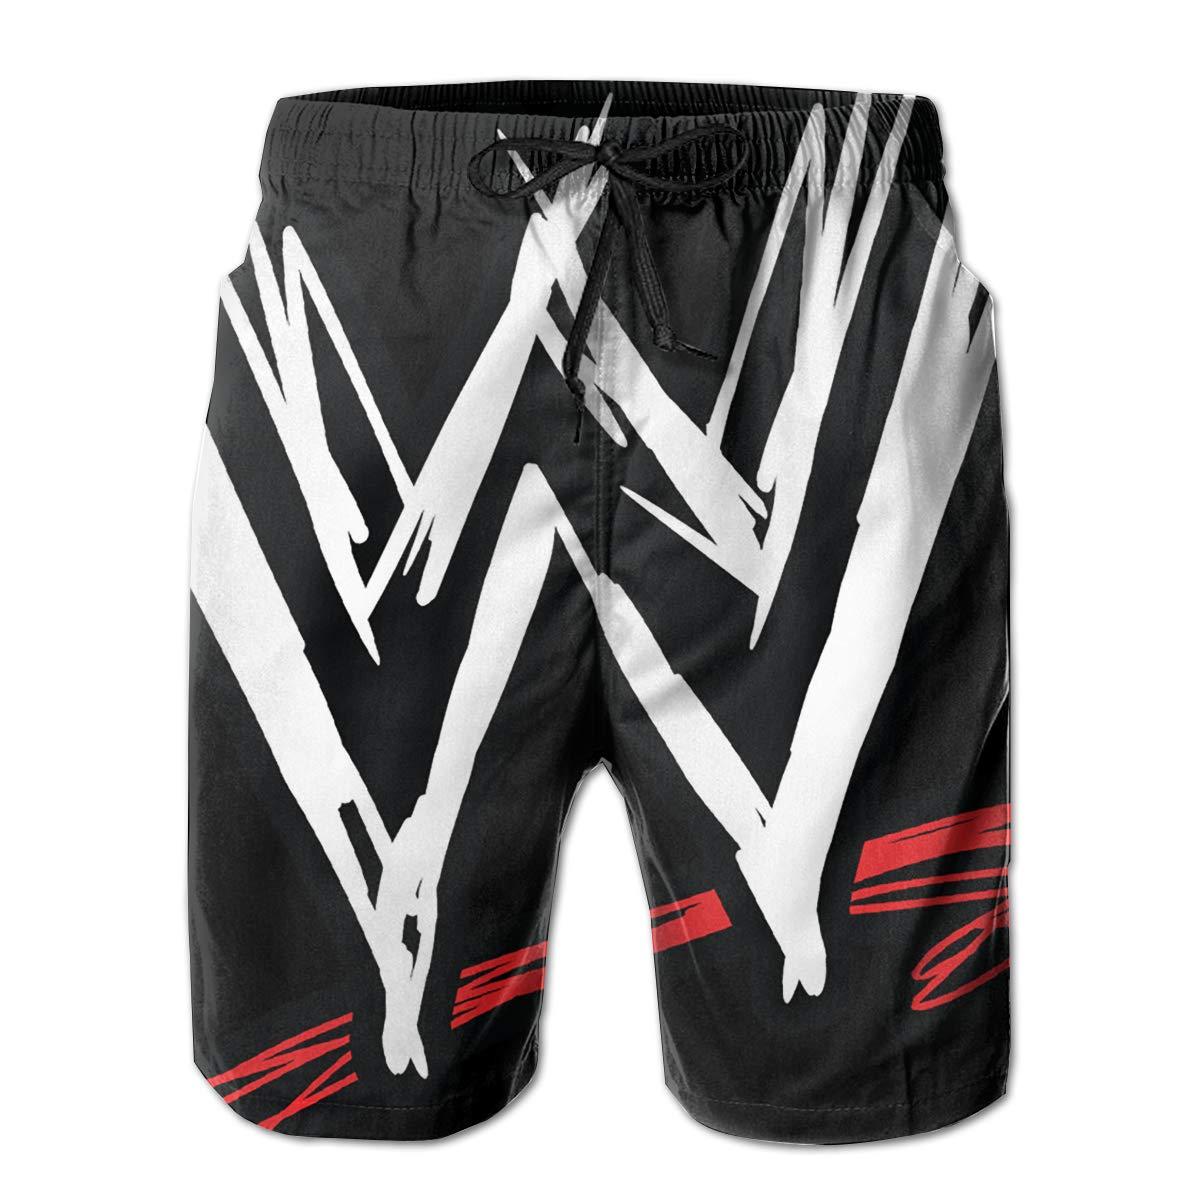 Mens WWE Logo Shorts Lightweight Swim Trunks Beach Shorts,Boardshort 30